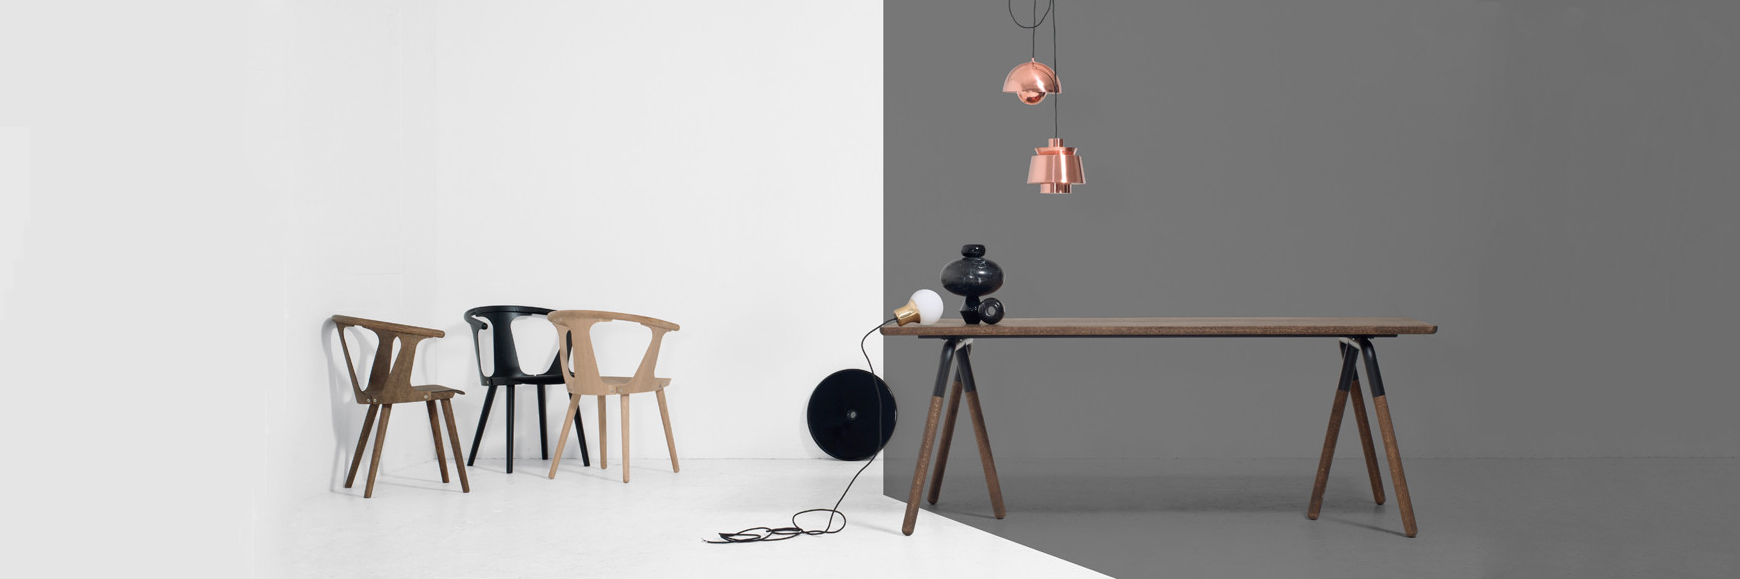 andtradition-utzon-furniture-papillon-pendant.jpg